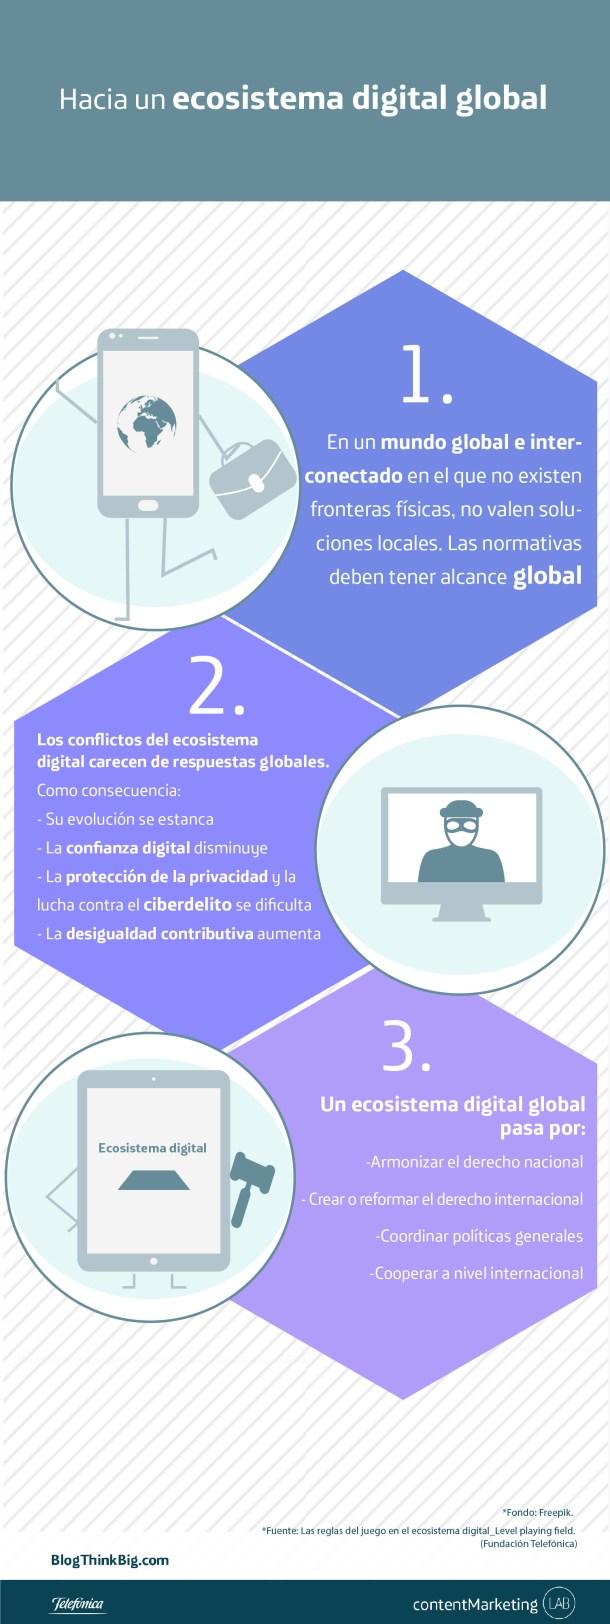 Level playing field: Ecosistema digital global